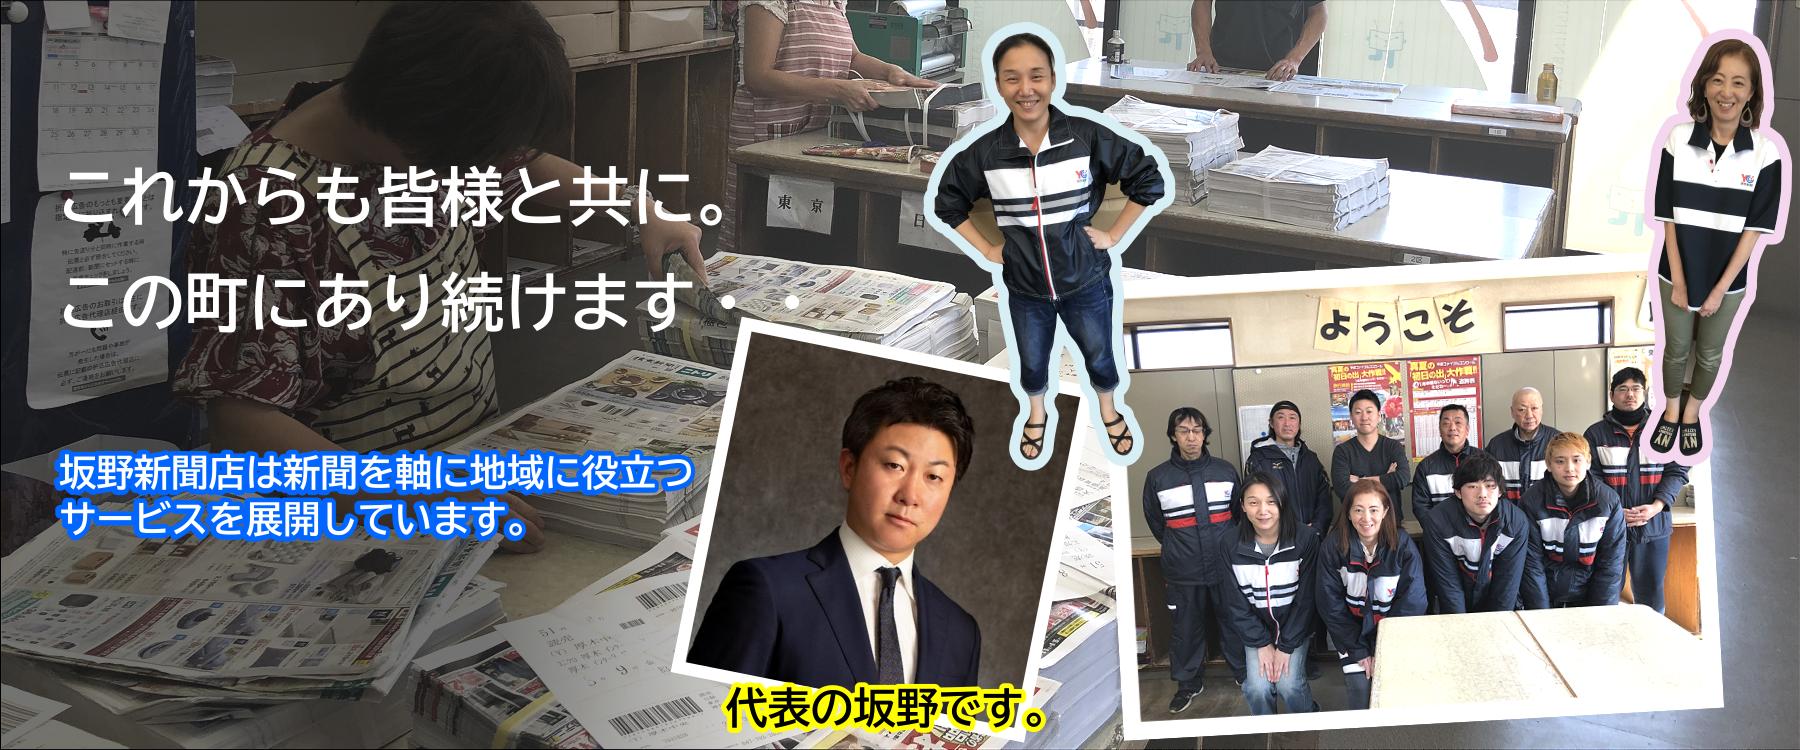 読売センター厚木中央 坂野新聞店